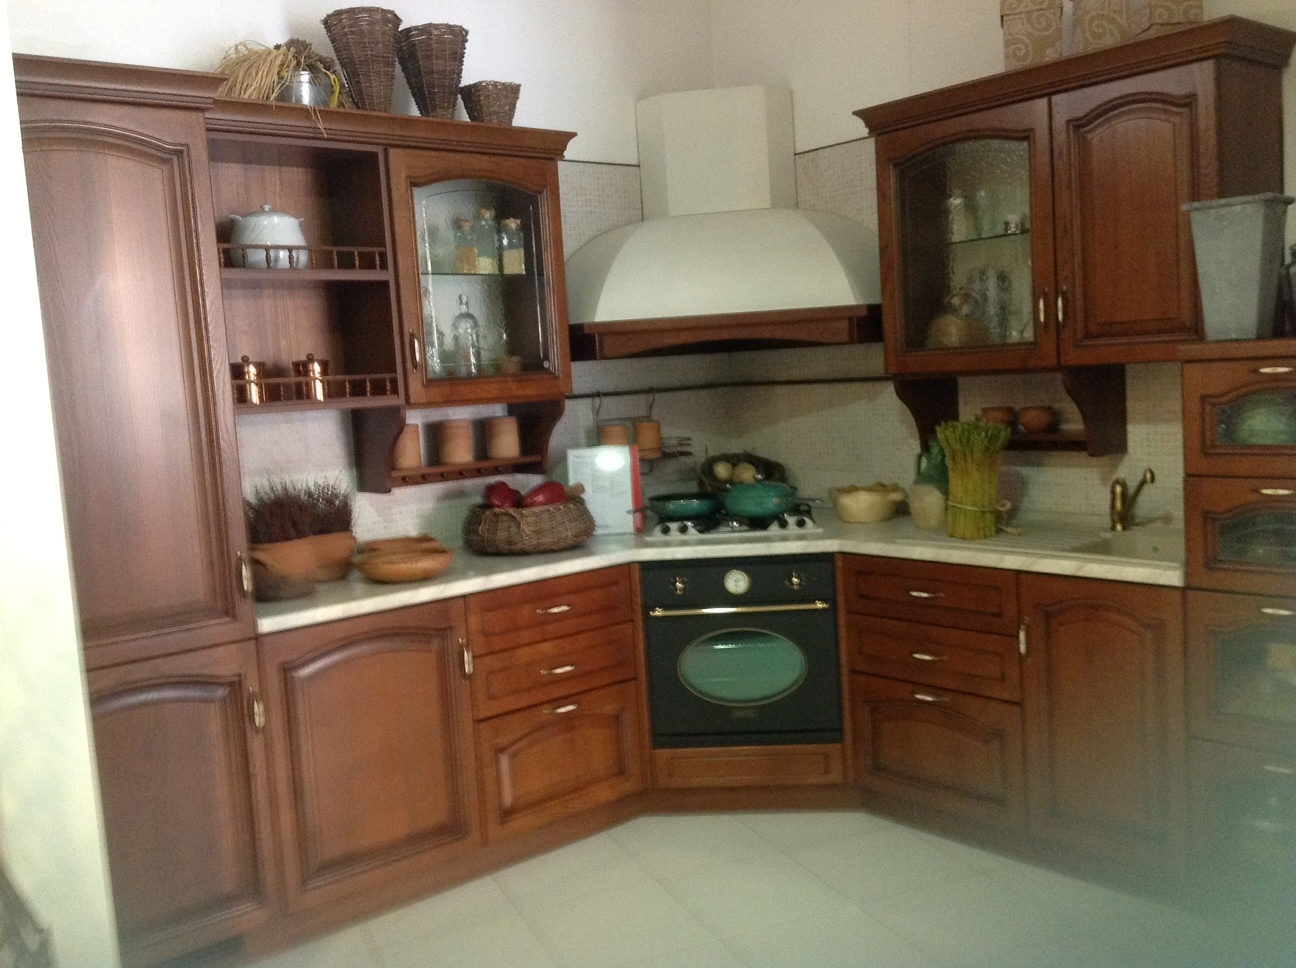 Cucina scavolini margot legno cucine a prezzi scontati for Idee arredo cucina classica